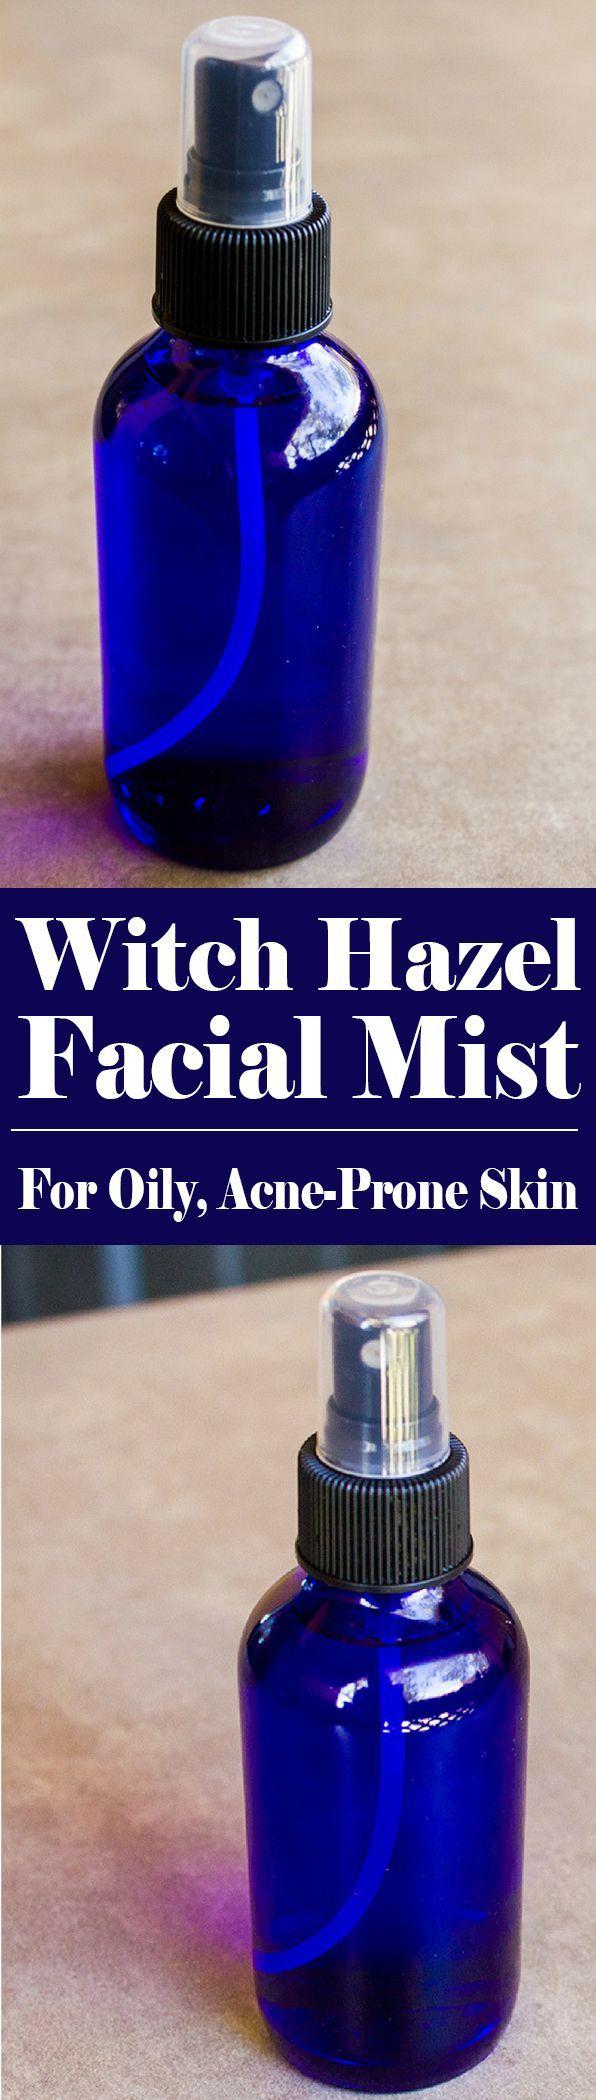 Witch Hazel for Acne-Prone Skin | Witch Hazel Facial Mist | homemadeforelle.com